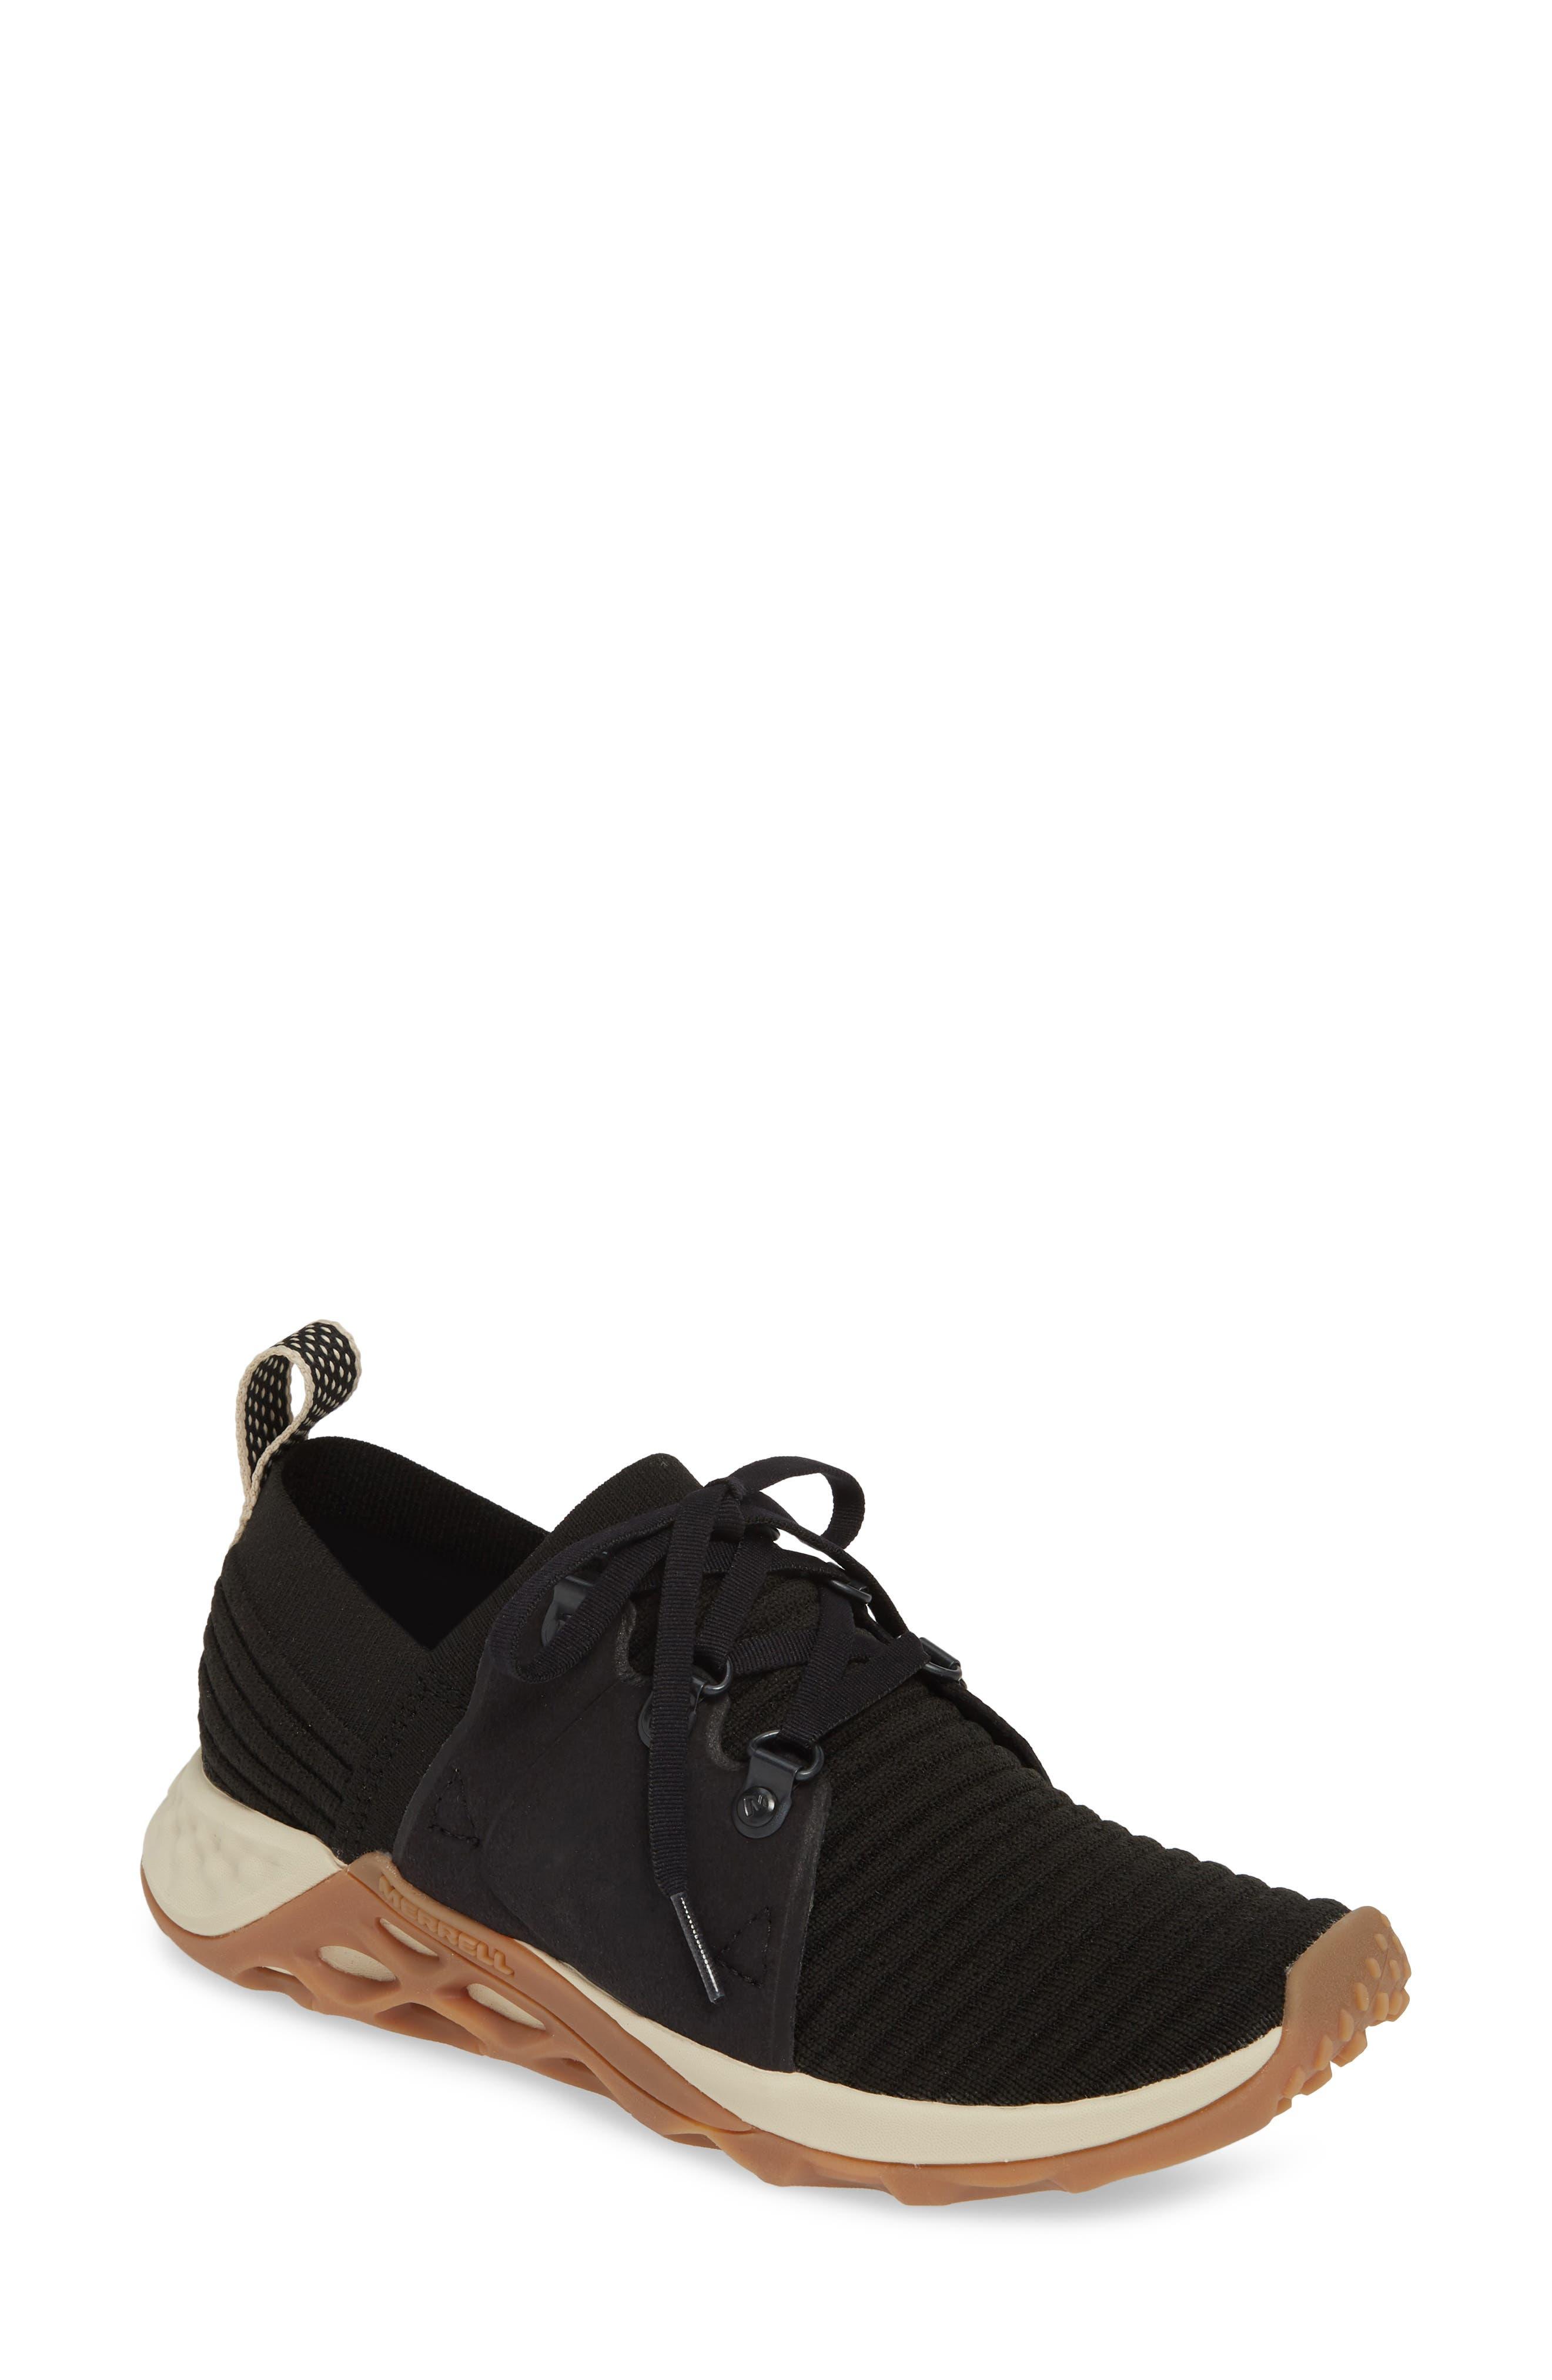 Range Ac+ Sneaker